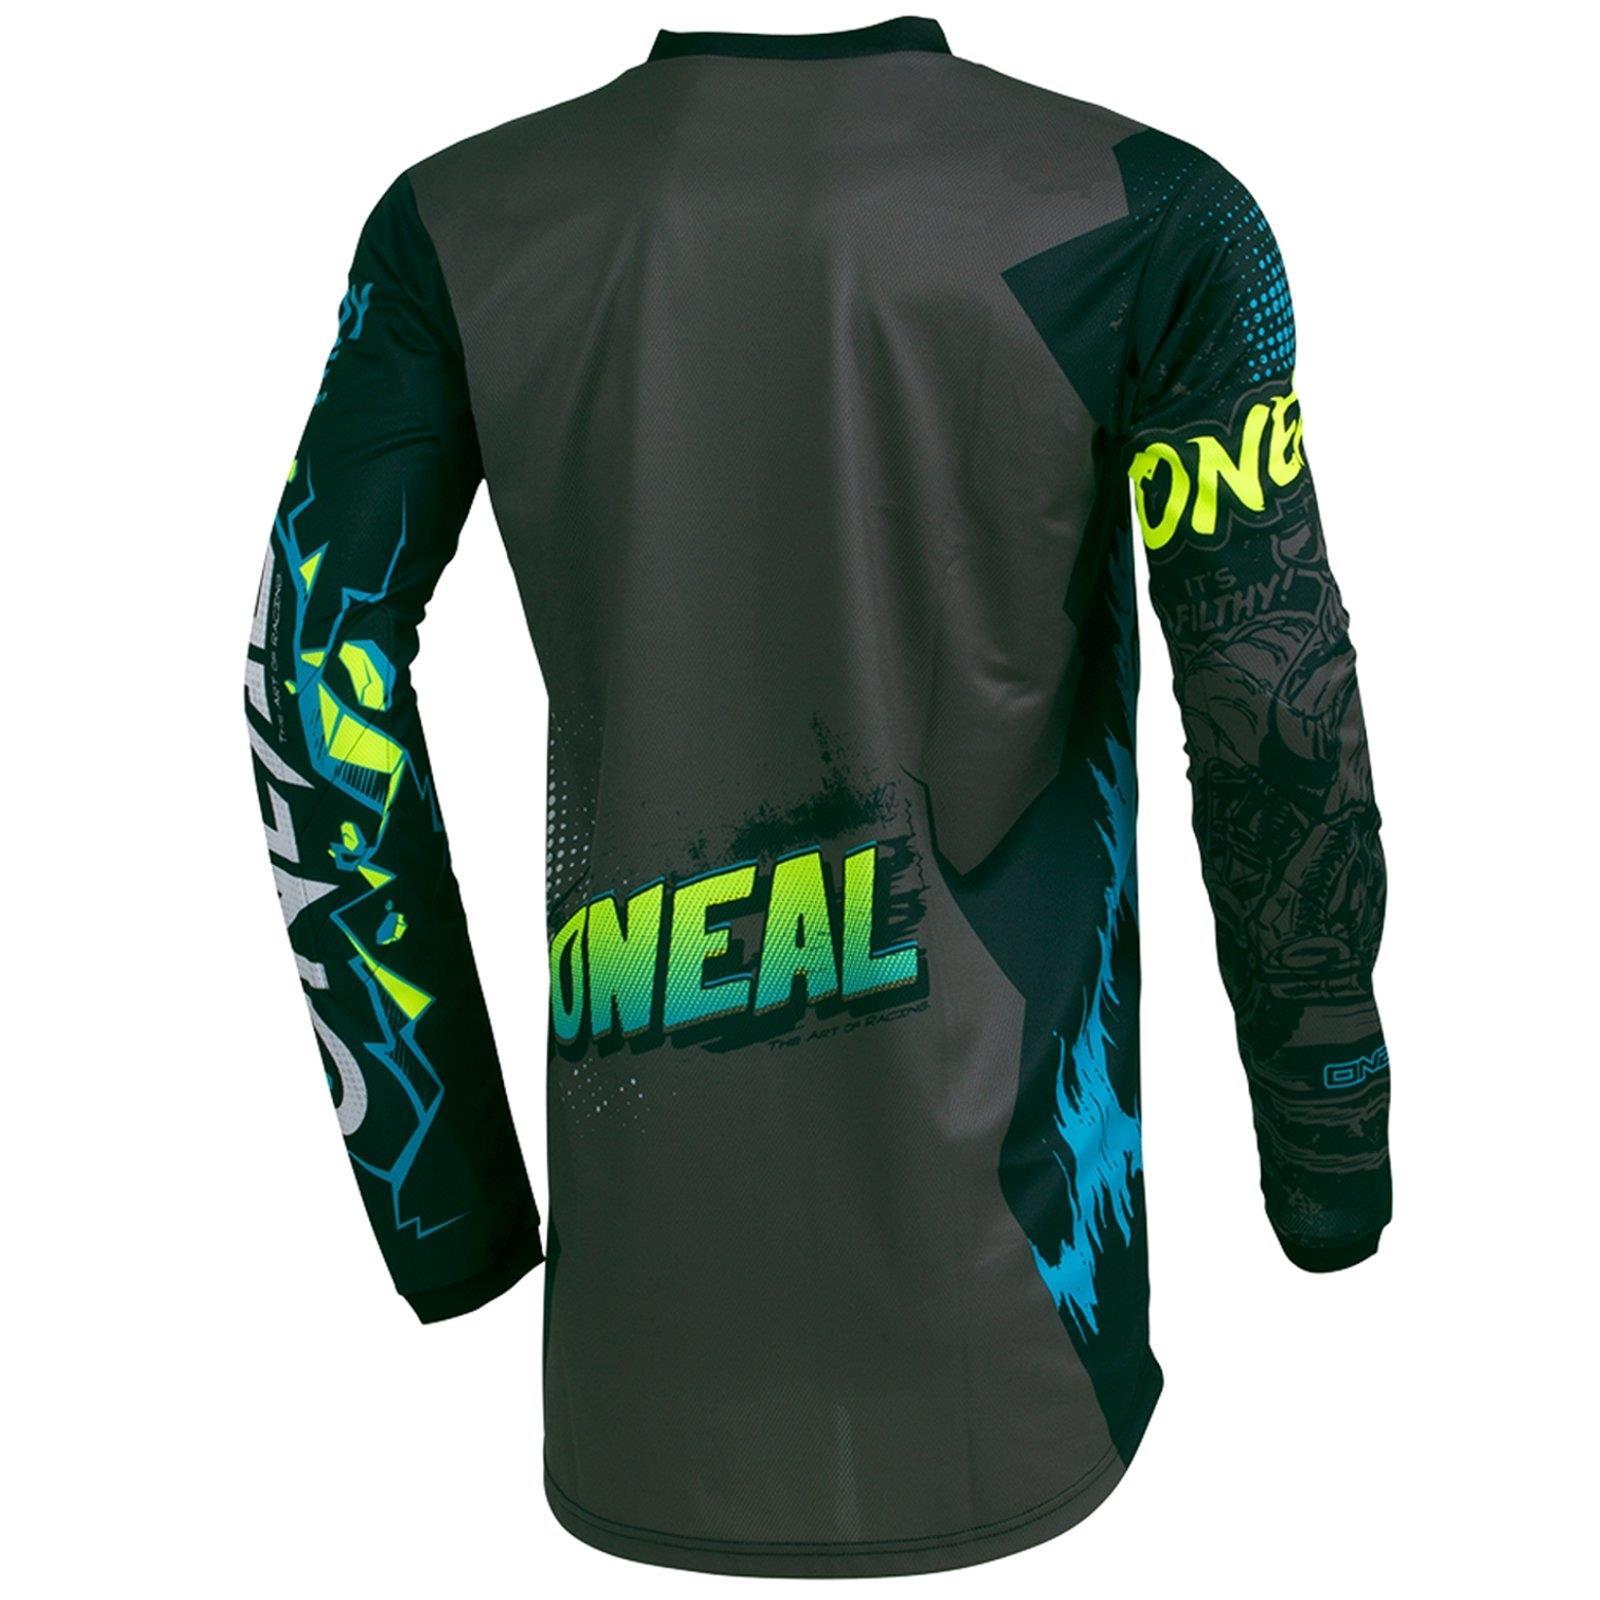 O-039-Neal-elemento-Villain-Motocross-Jersey-Enduro-MX-MTB-FR-DH-MAGLIA-MOUNTAIN-BIKE miniatura 9